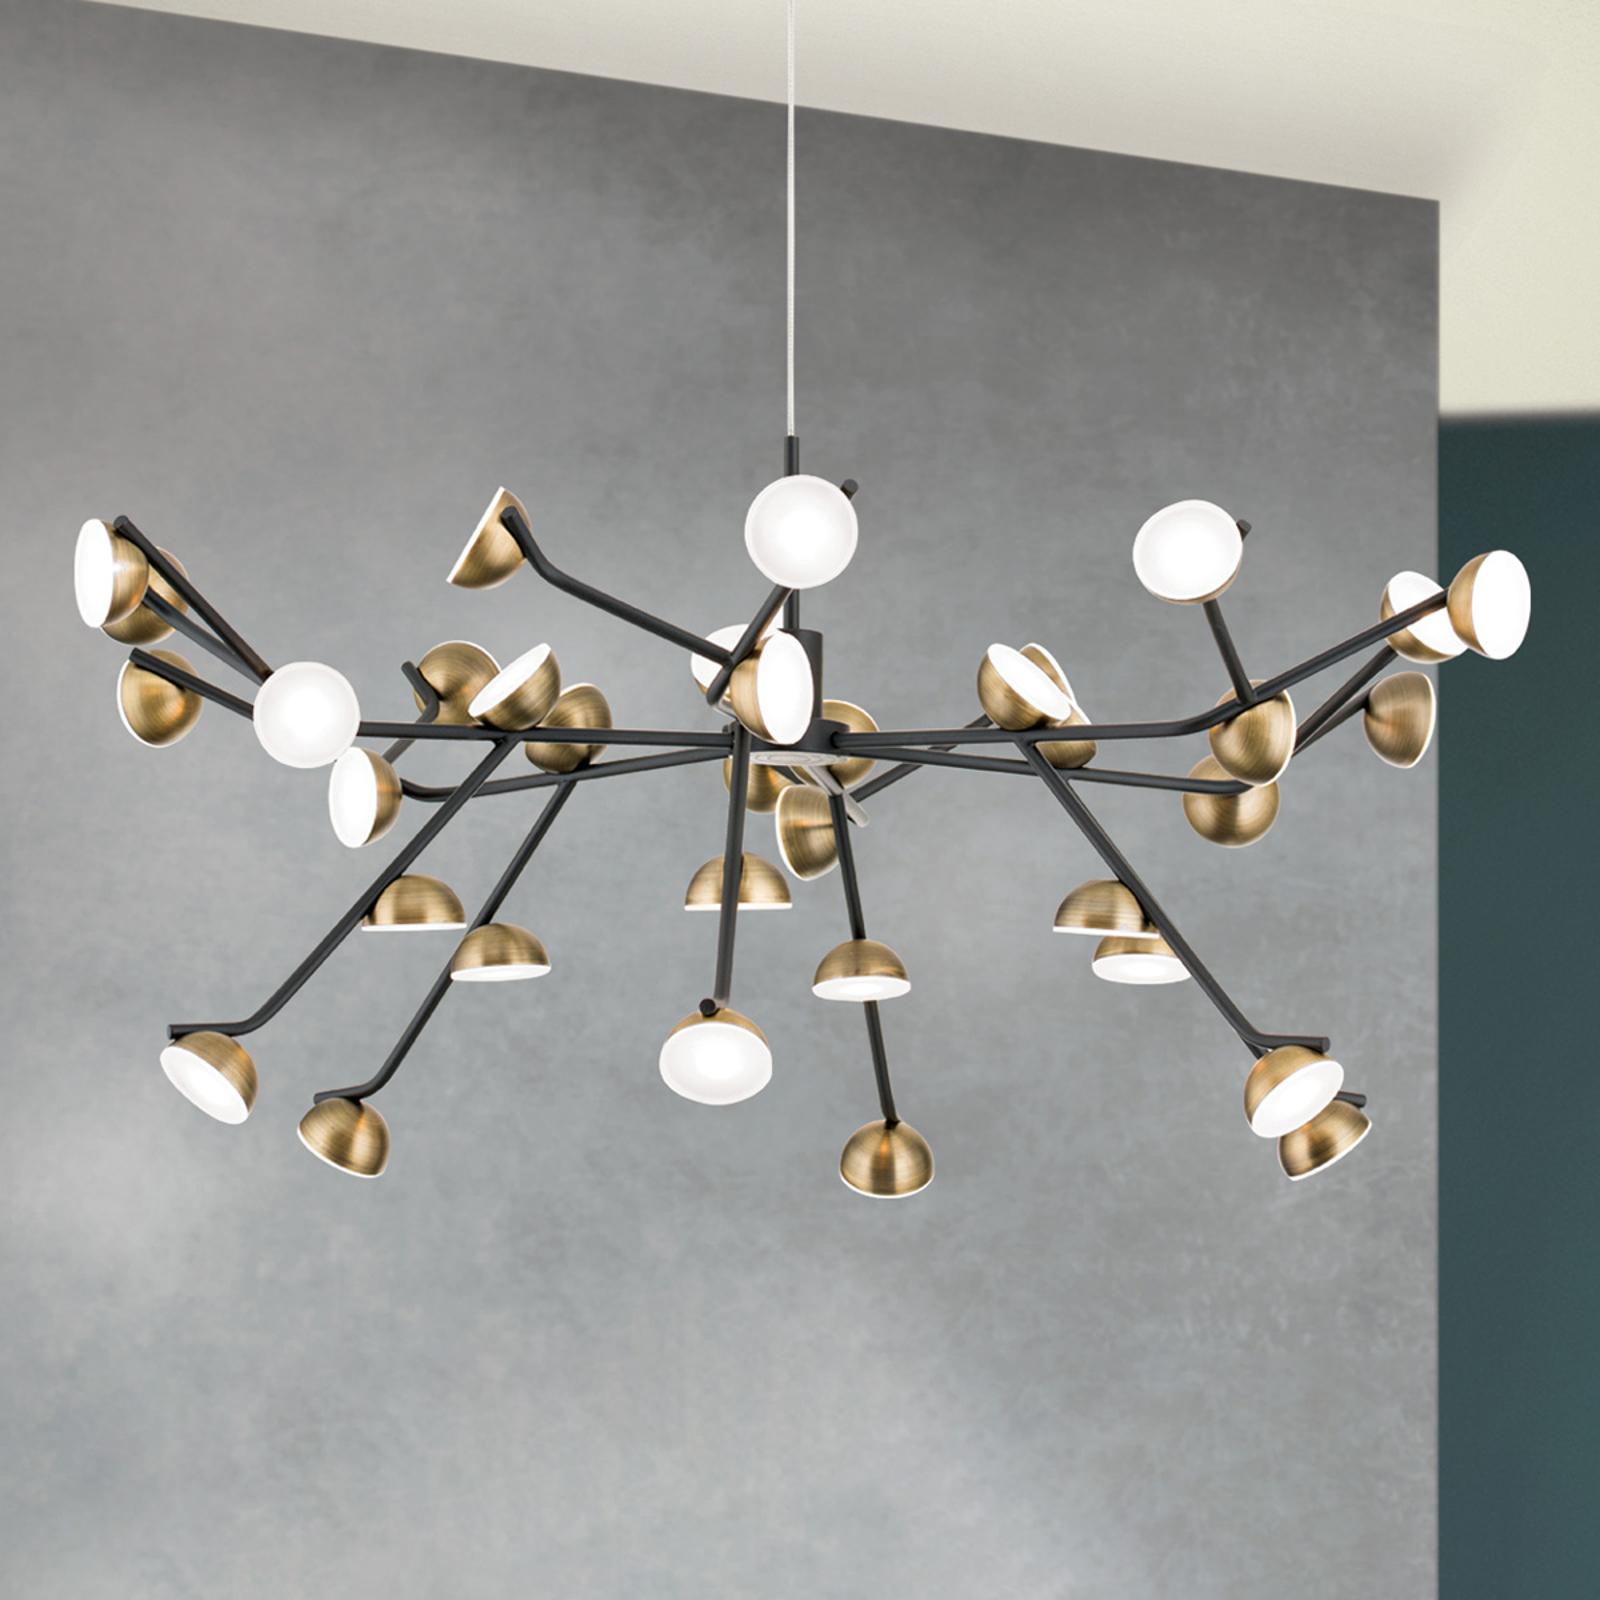 Lampada LED a sospensione Blossom, 36 luci